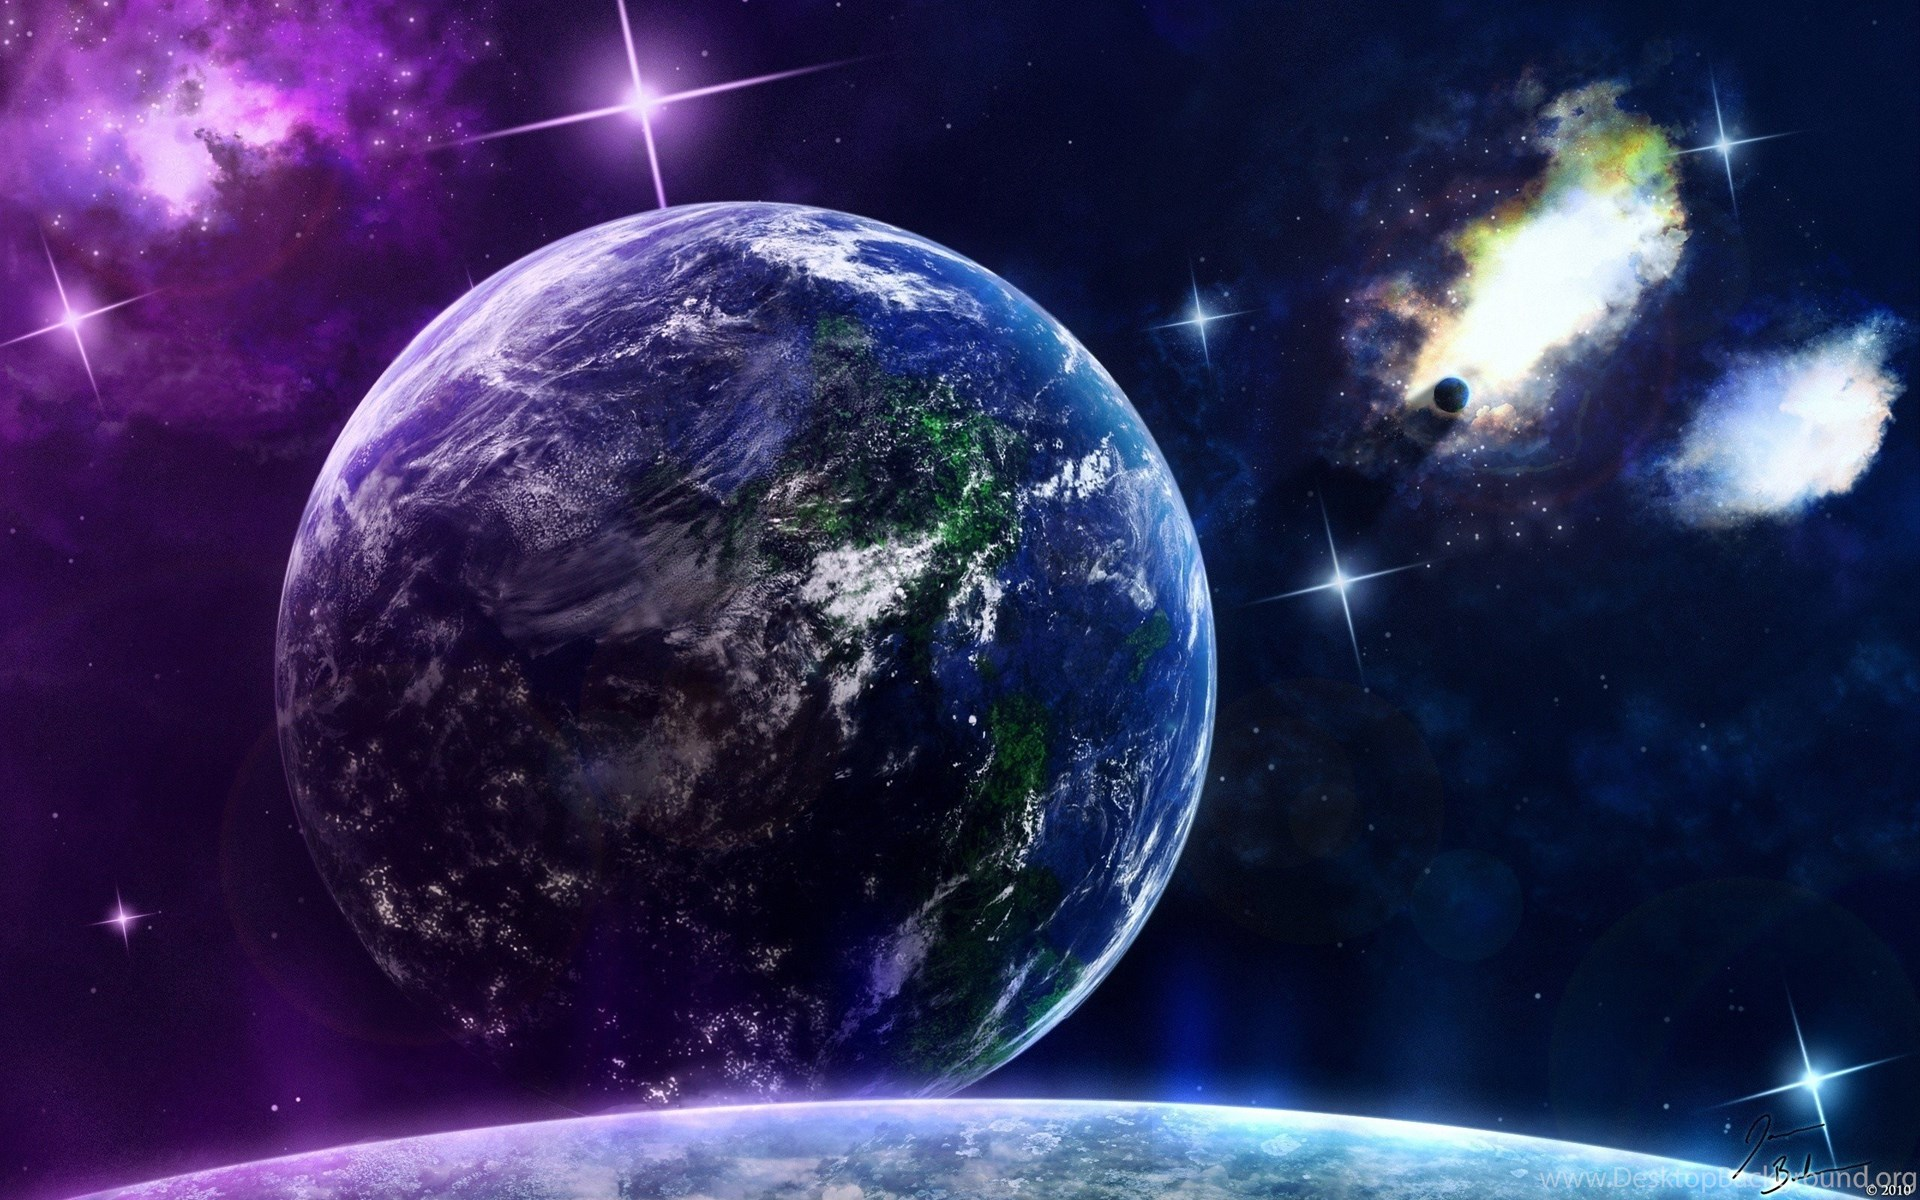 628442 earth beauty galaxy hd